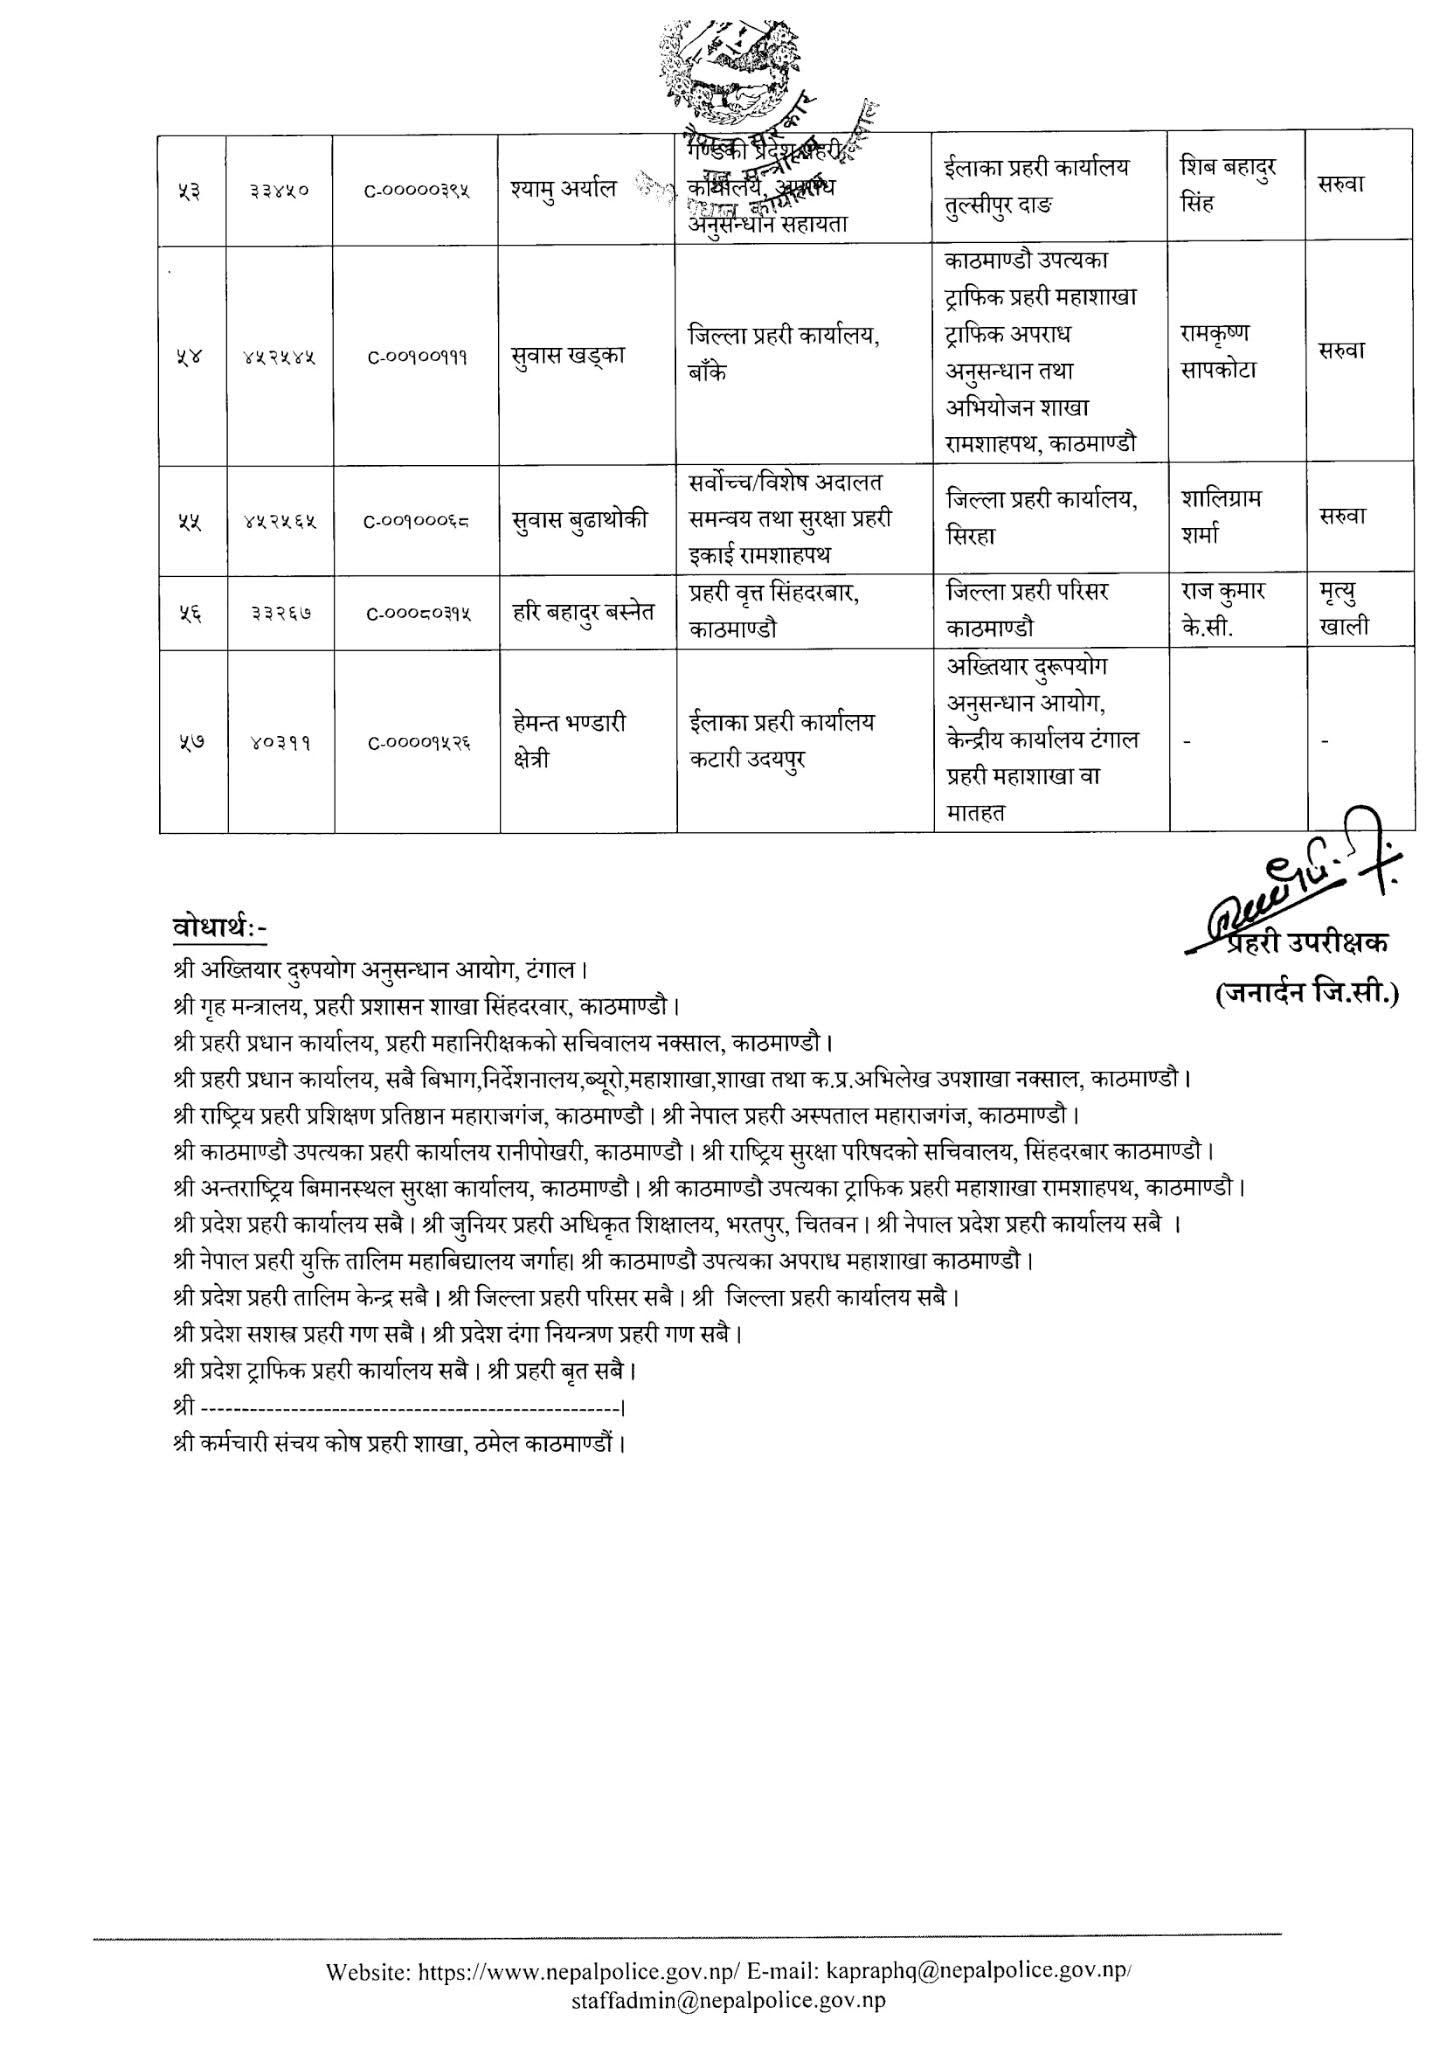 Nepal Police - Transfer List of 57 Deputy Superintendent of Nepal Police (DySP)